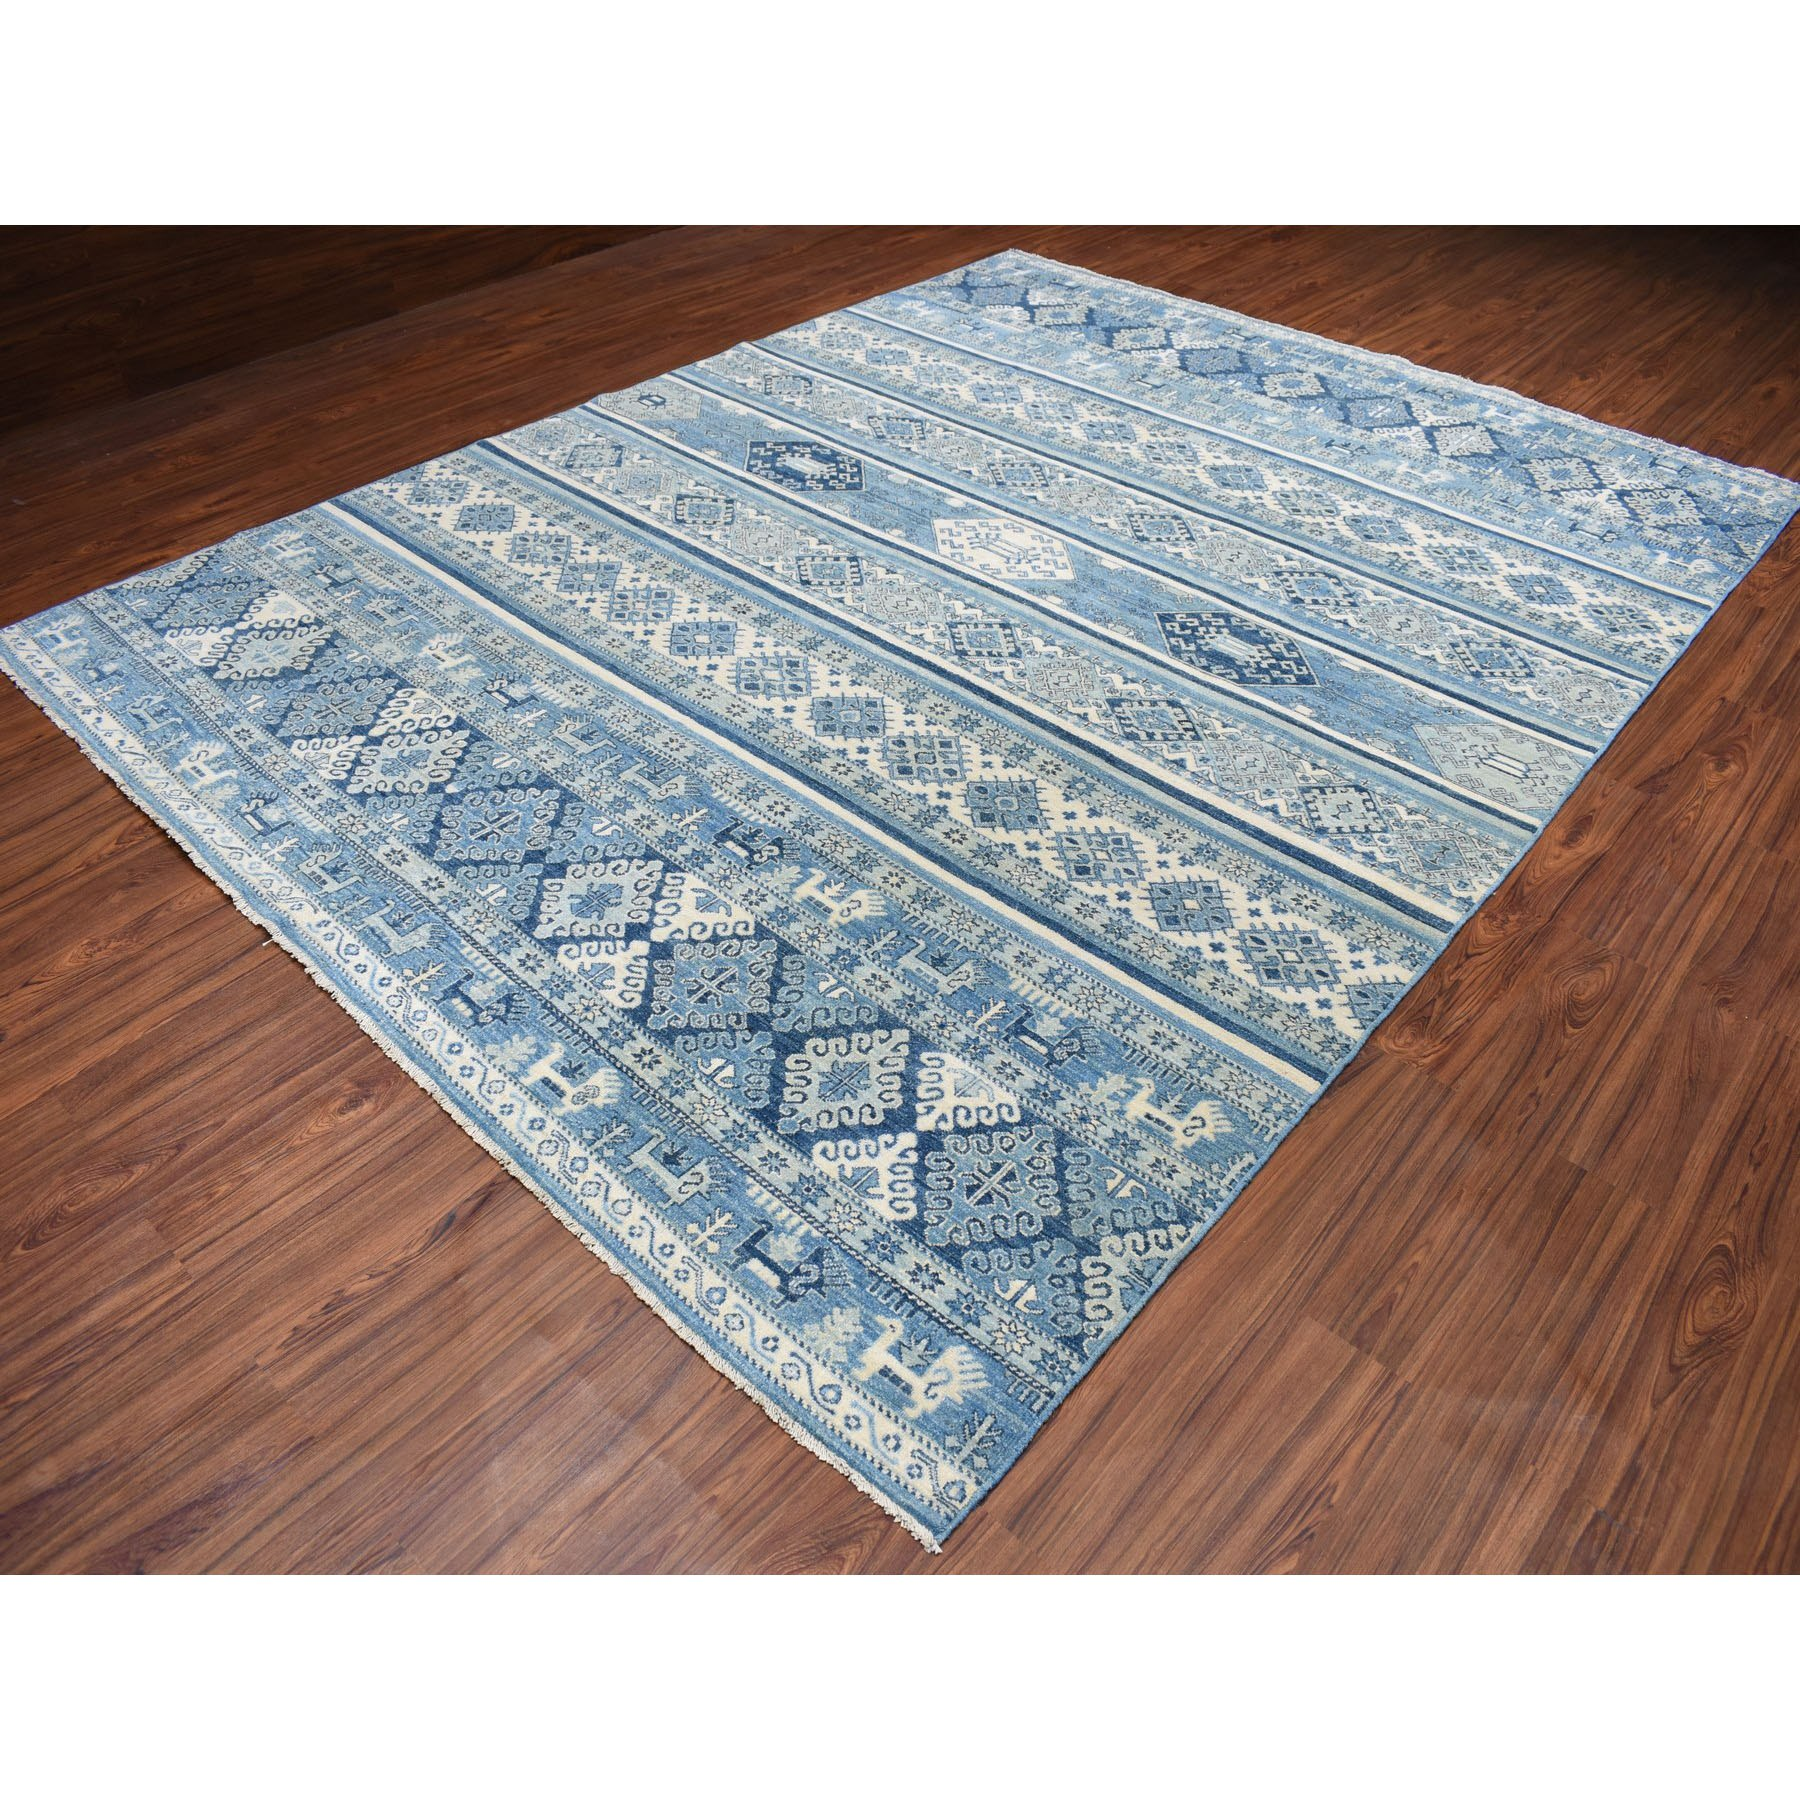 9-x11-8  Blue Super Kazak Khorjin Design Pure Wool Hand-Knotted Oriental Rug